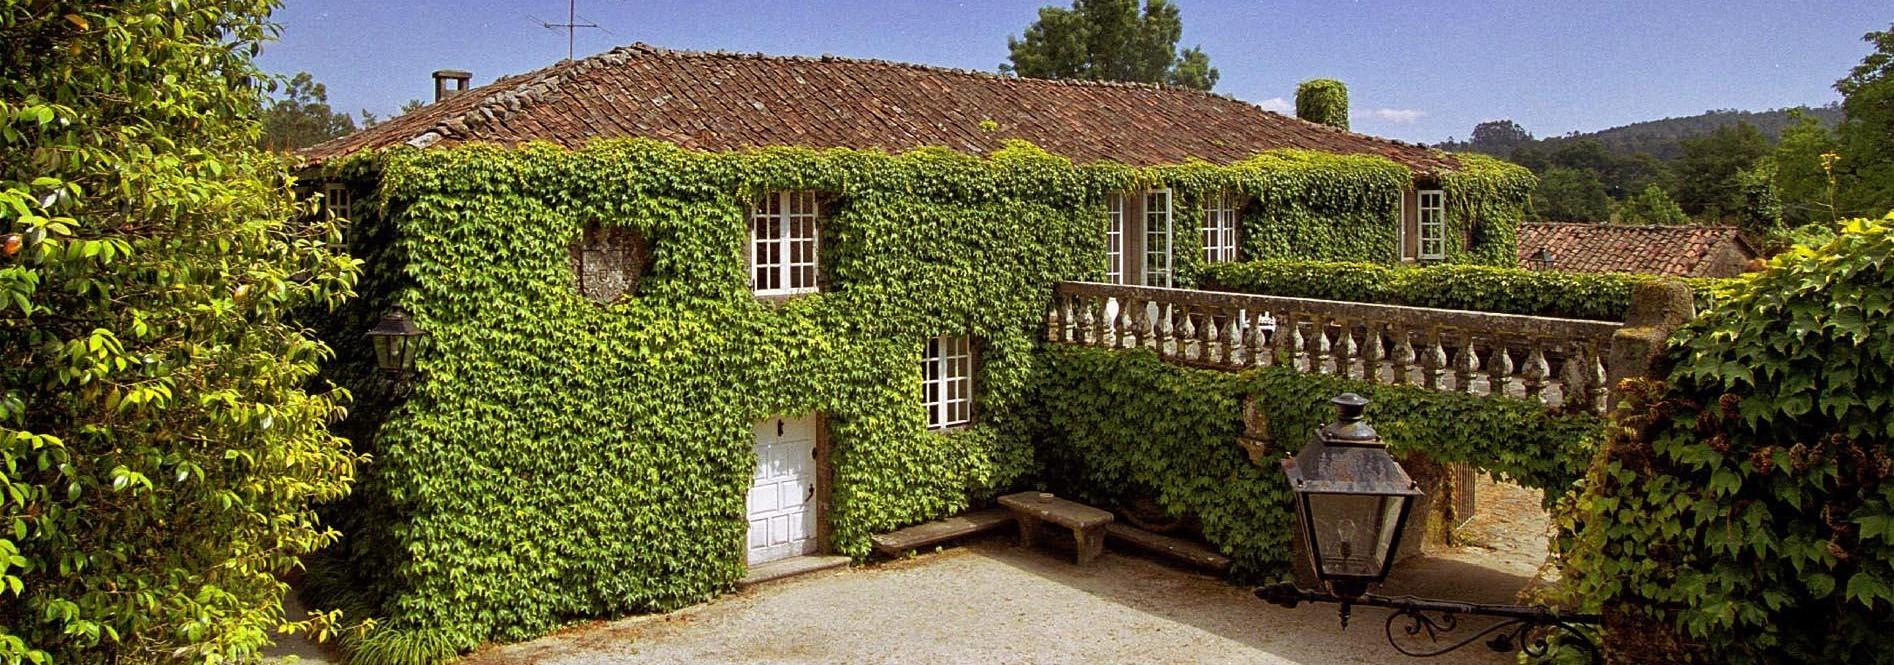 Lan ois doval - Casas rurales con encanto en galicia ...